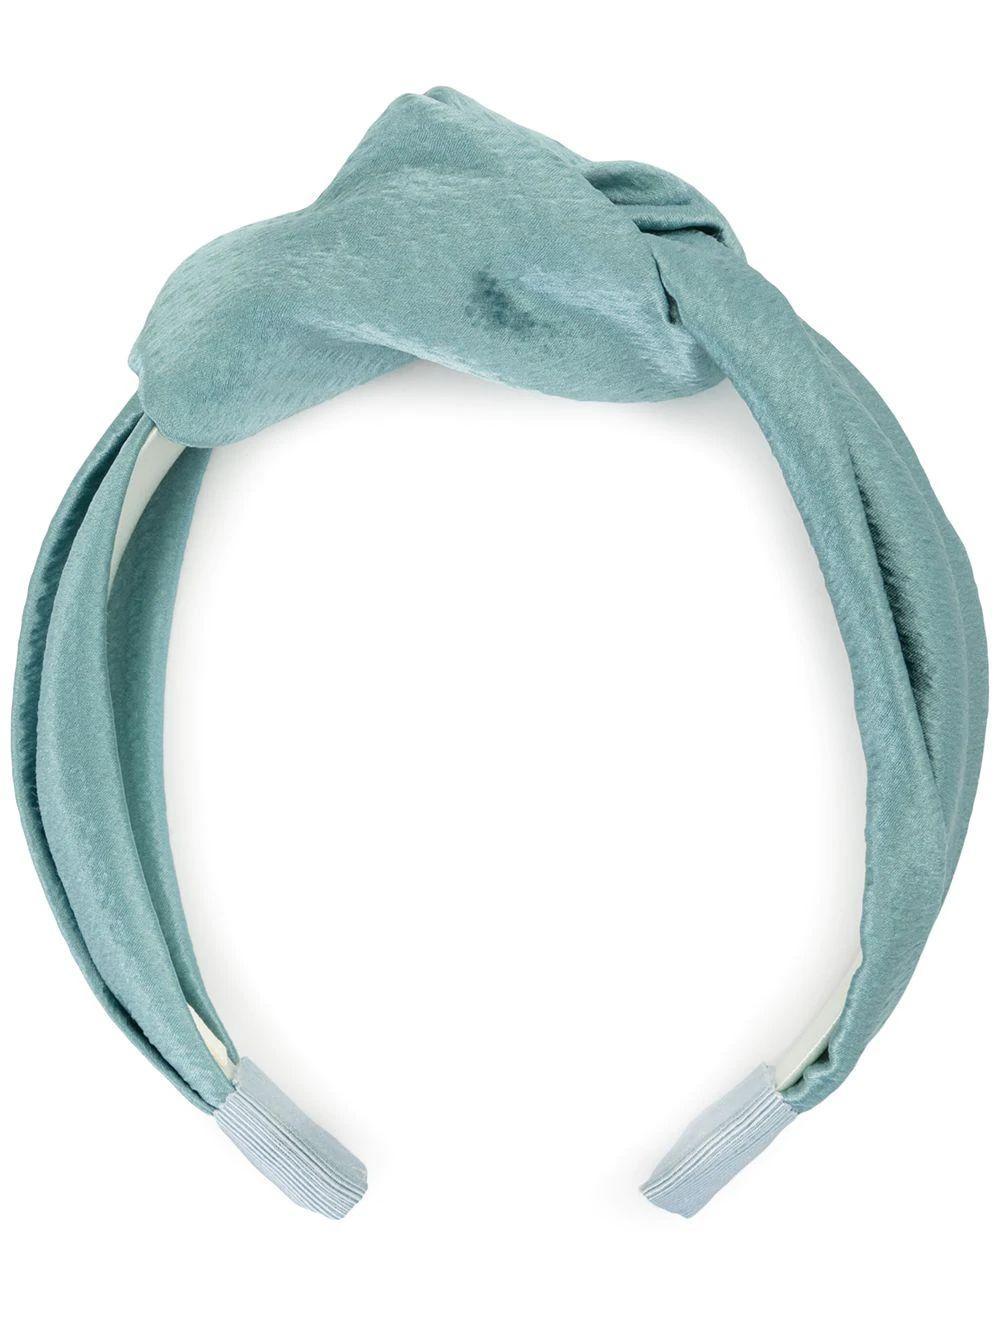 Samaya Hammered Silk Headband